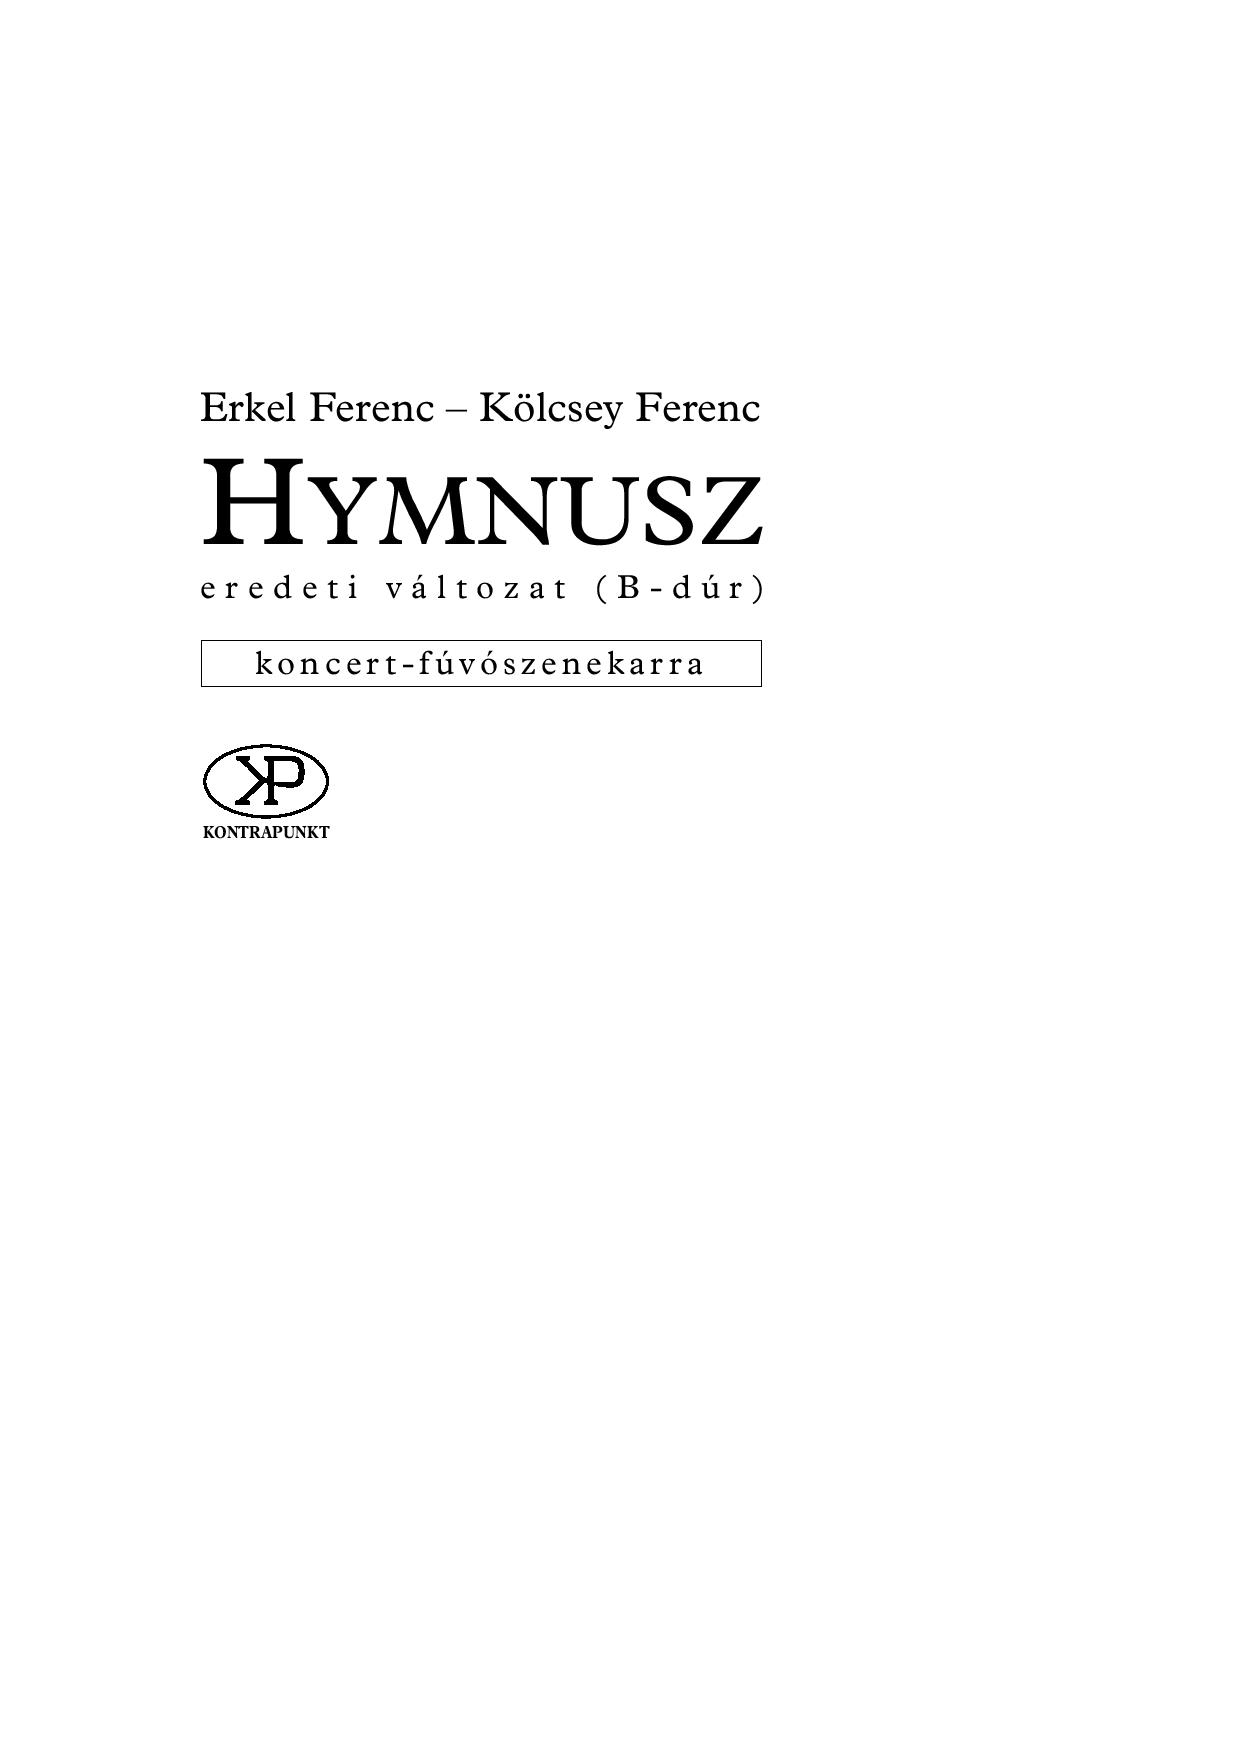 K-0520_Himnusz_koncert_fuvos-B_PARTITURA-page-001